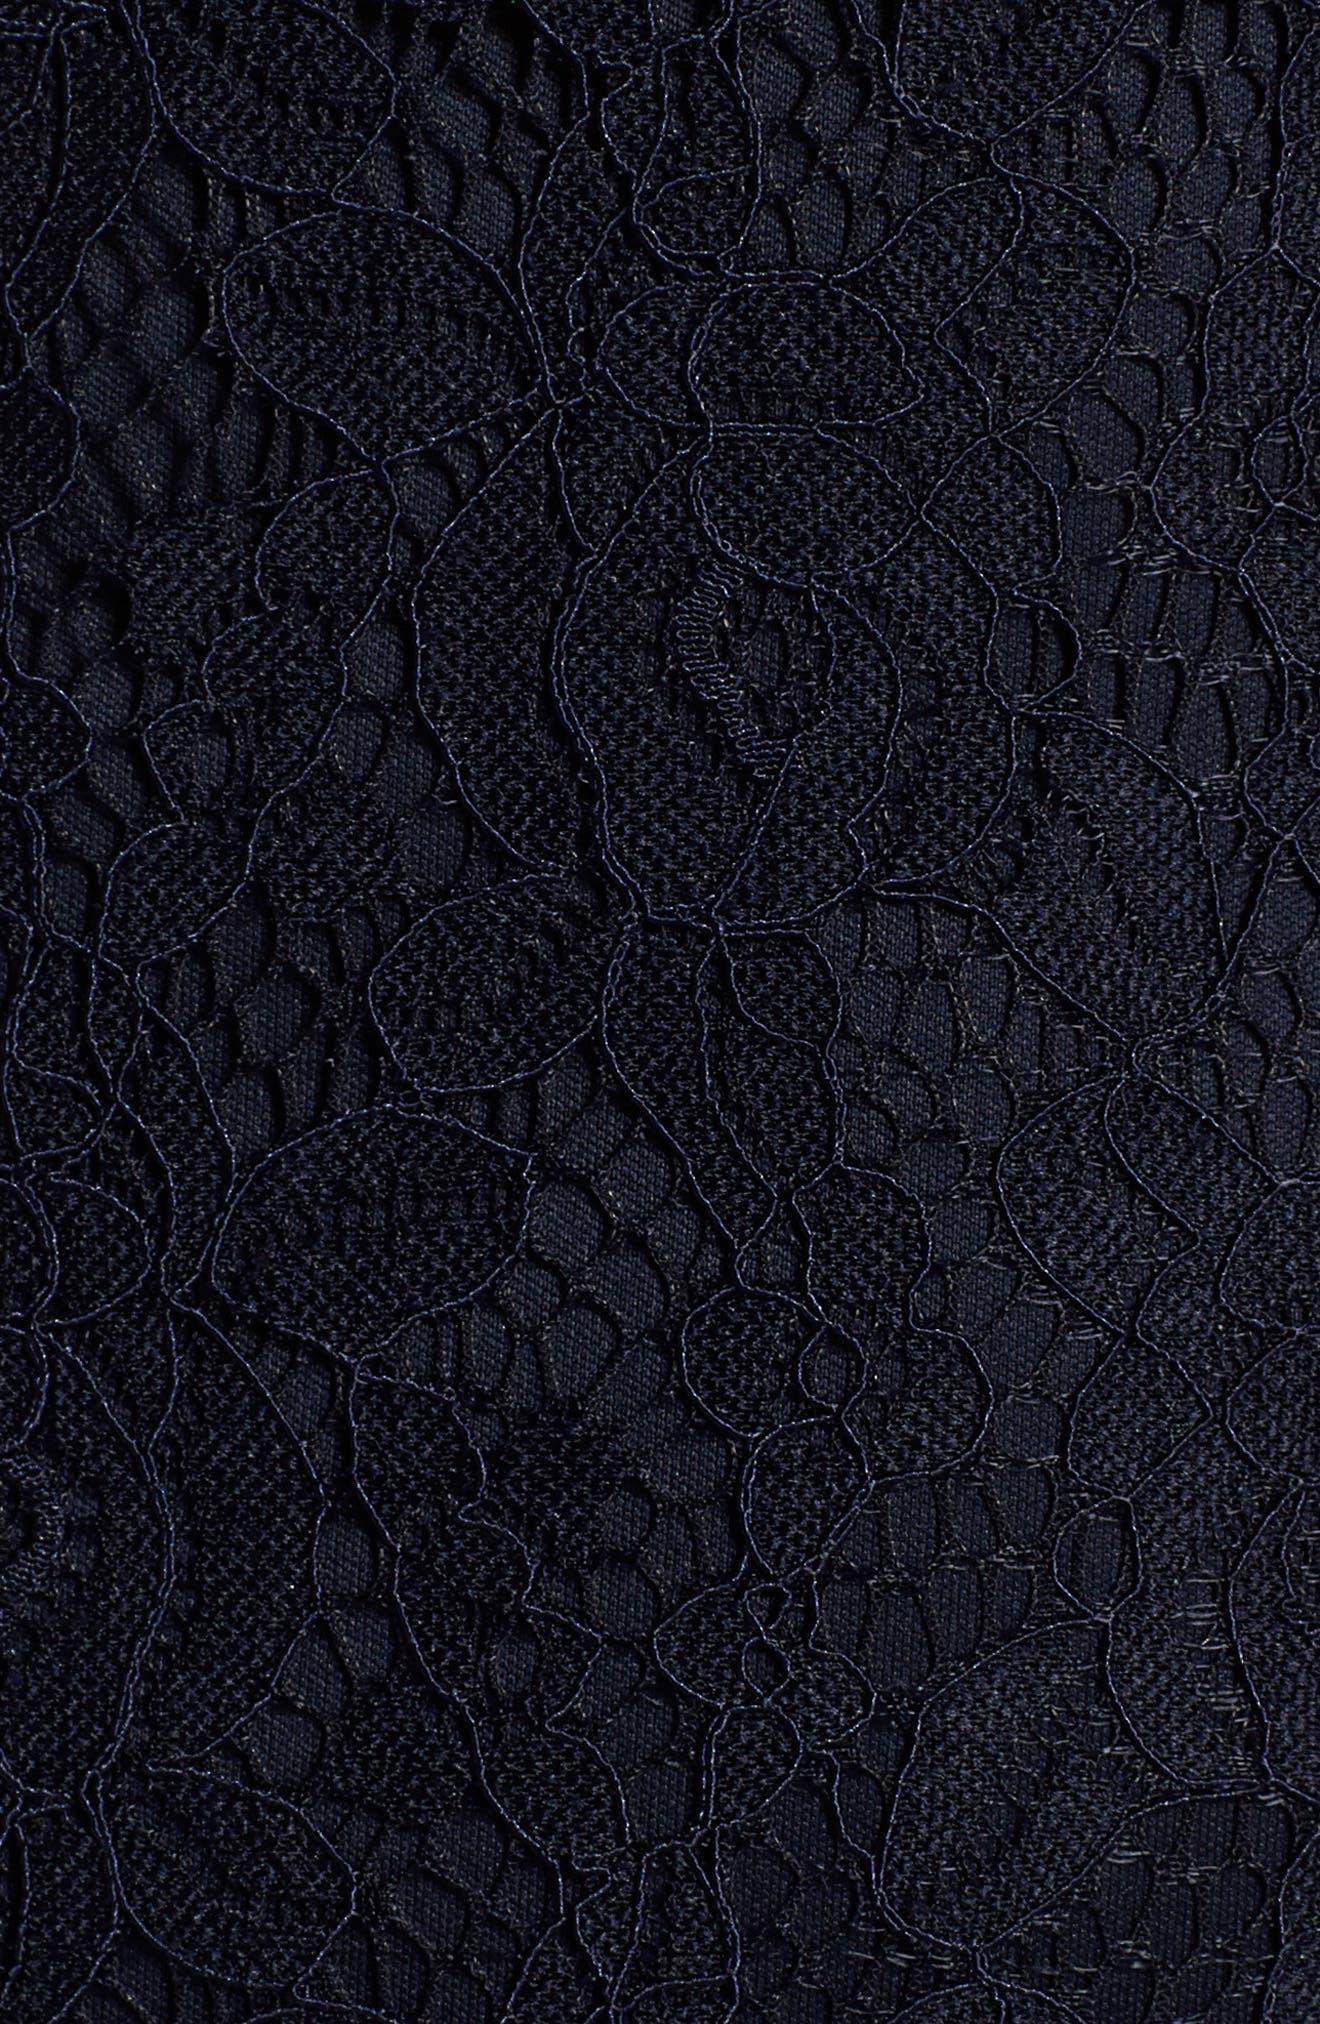 Cap Sleeve Lace Sheath Dress,                             Alternate thumbnail 5, color,                             NAVY